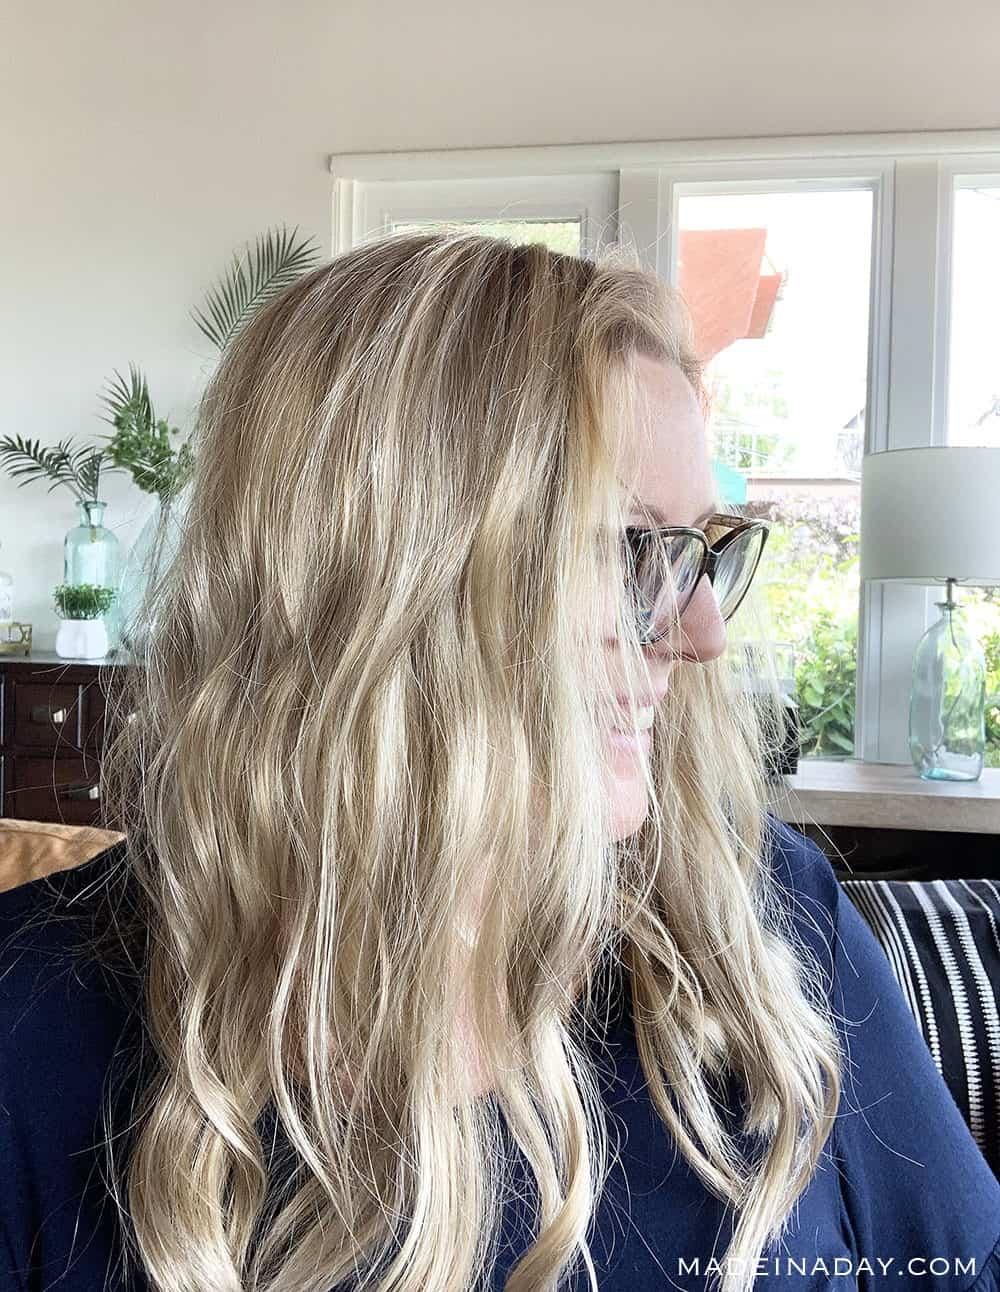 Jon Renau Malibu blonde 12FS12 Top Wave Topper Review, long blonde topper wig, hair toppers, beach wave topper, wavy wig topper